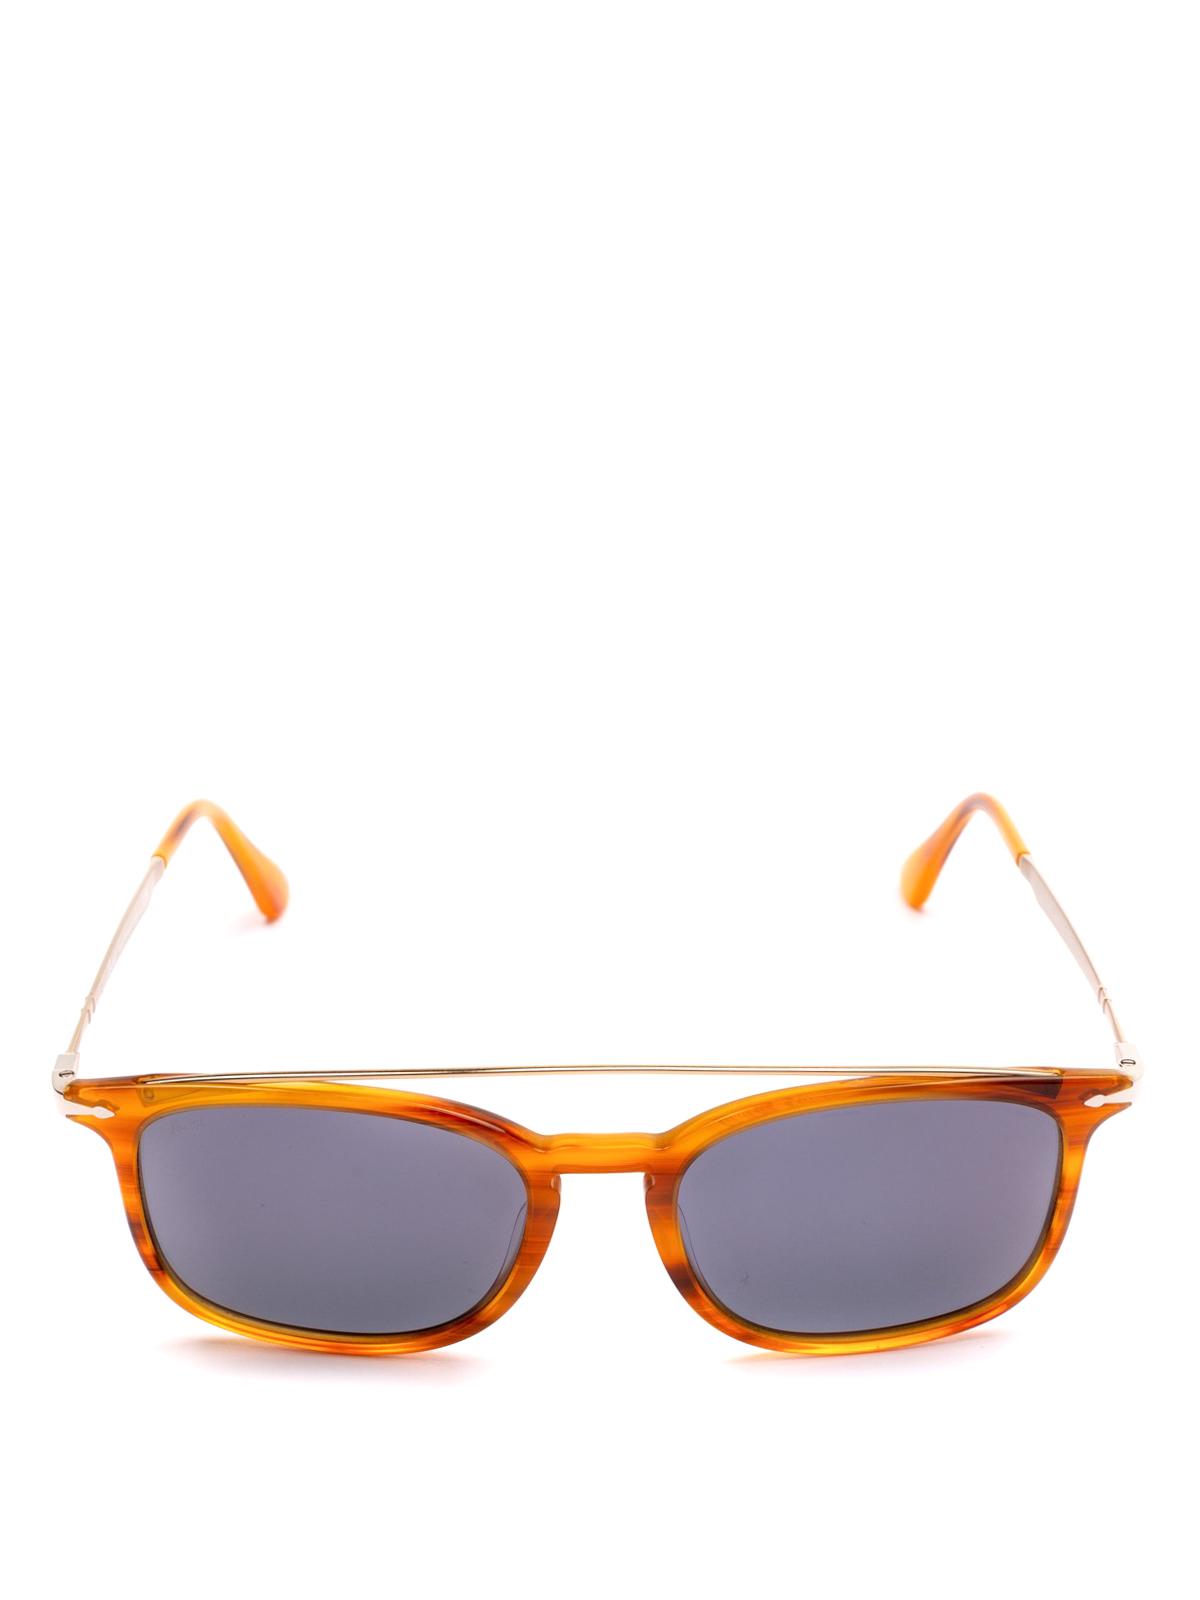 551f547f97 PERSOL  sunglasses online - Metal double bridge tortoise squared glasses